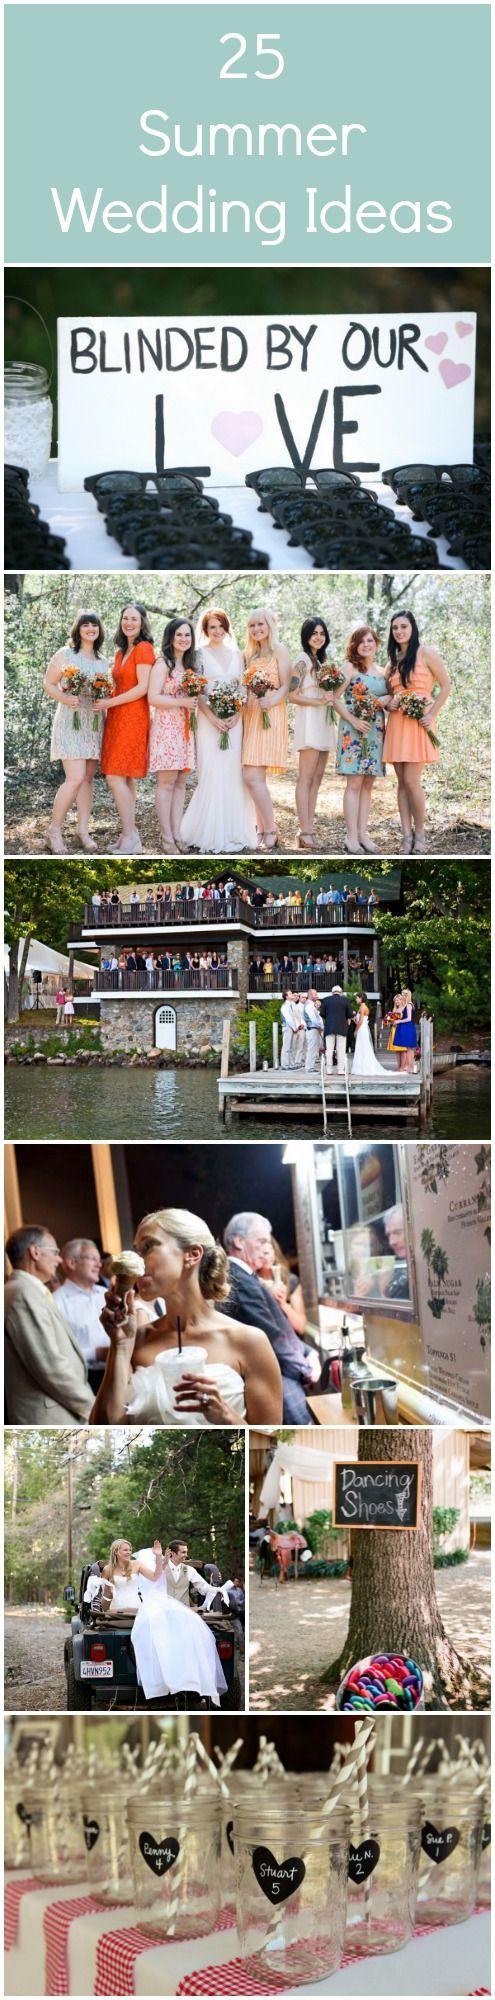 Wedding ideas for summer   Great Summer Wedding Ideas  Pinterest  Summer wedding ideas